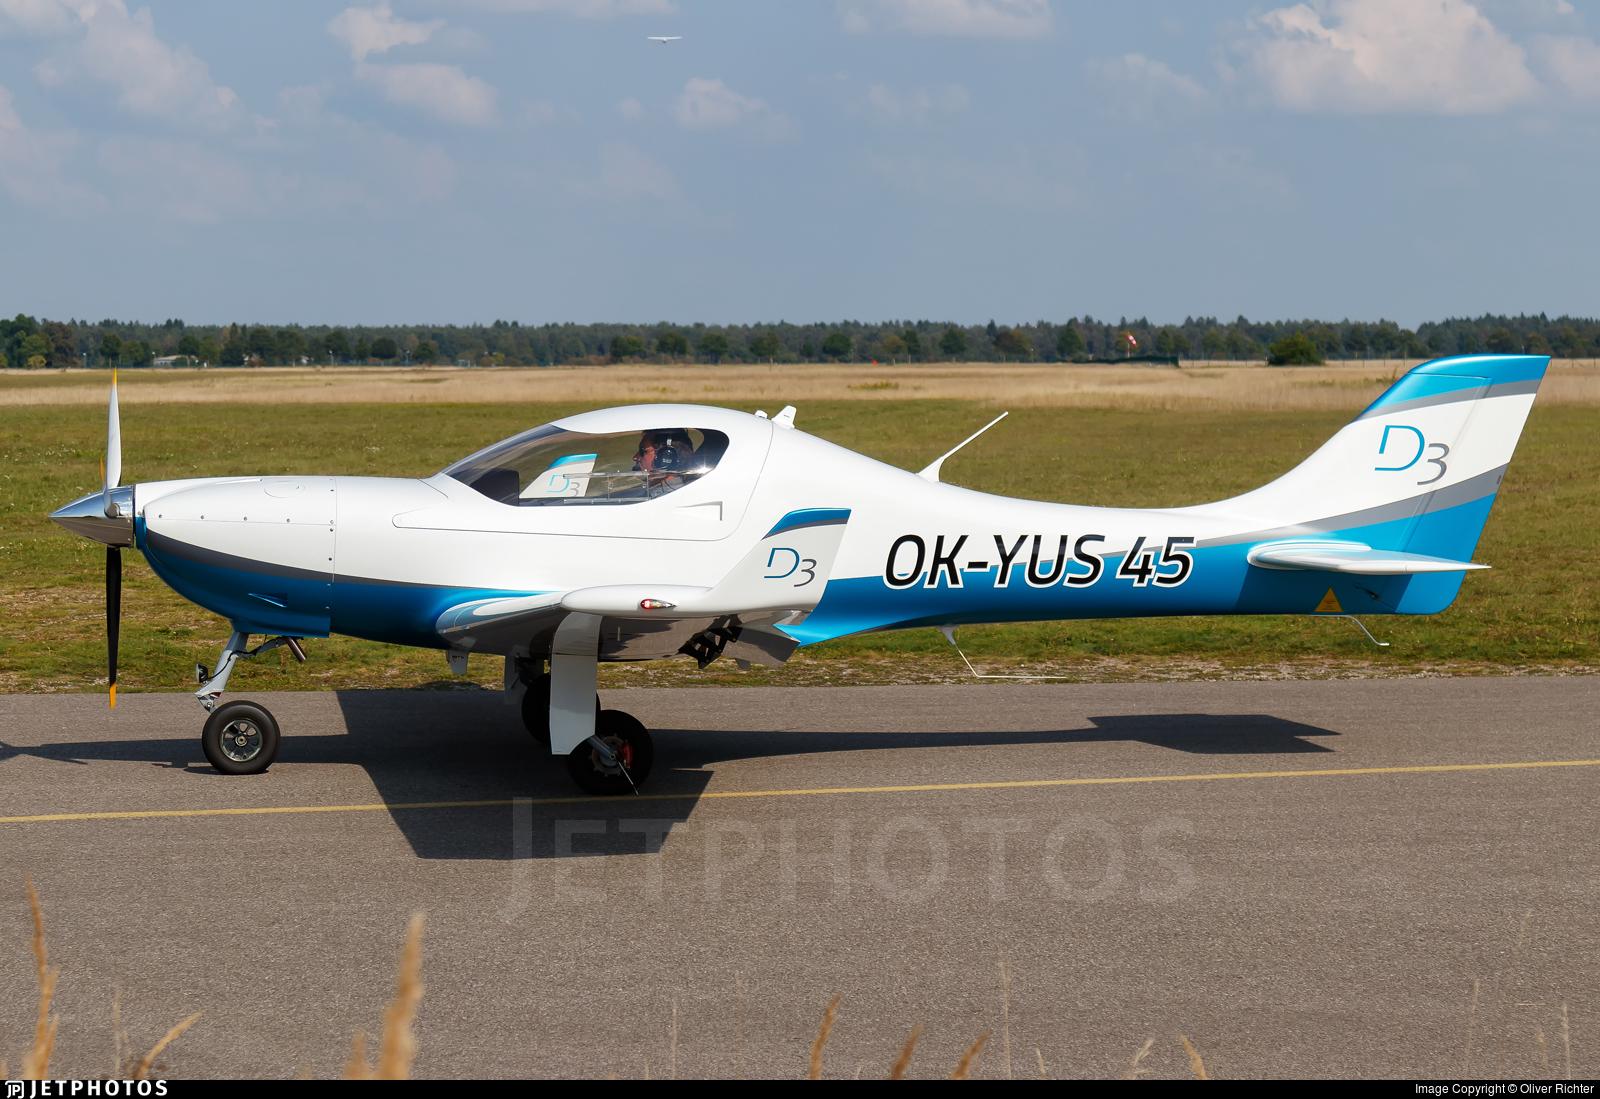 OK-YUS45 - AeroSpool WT9 Dynamic OK D3 - Private